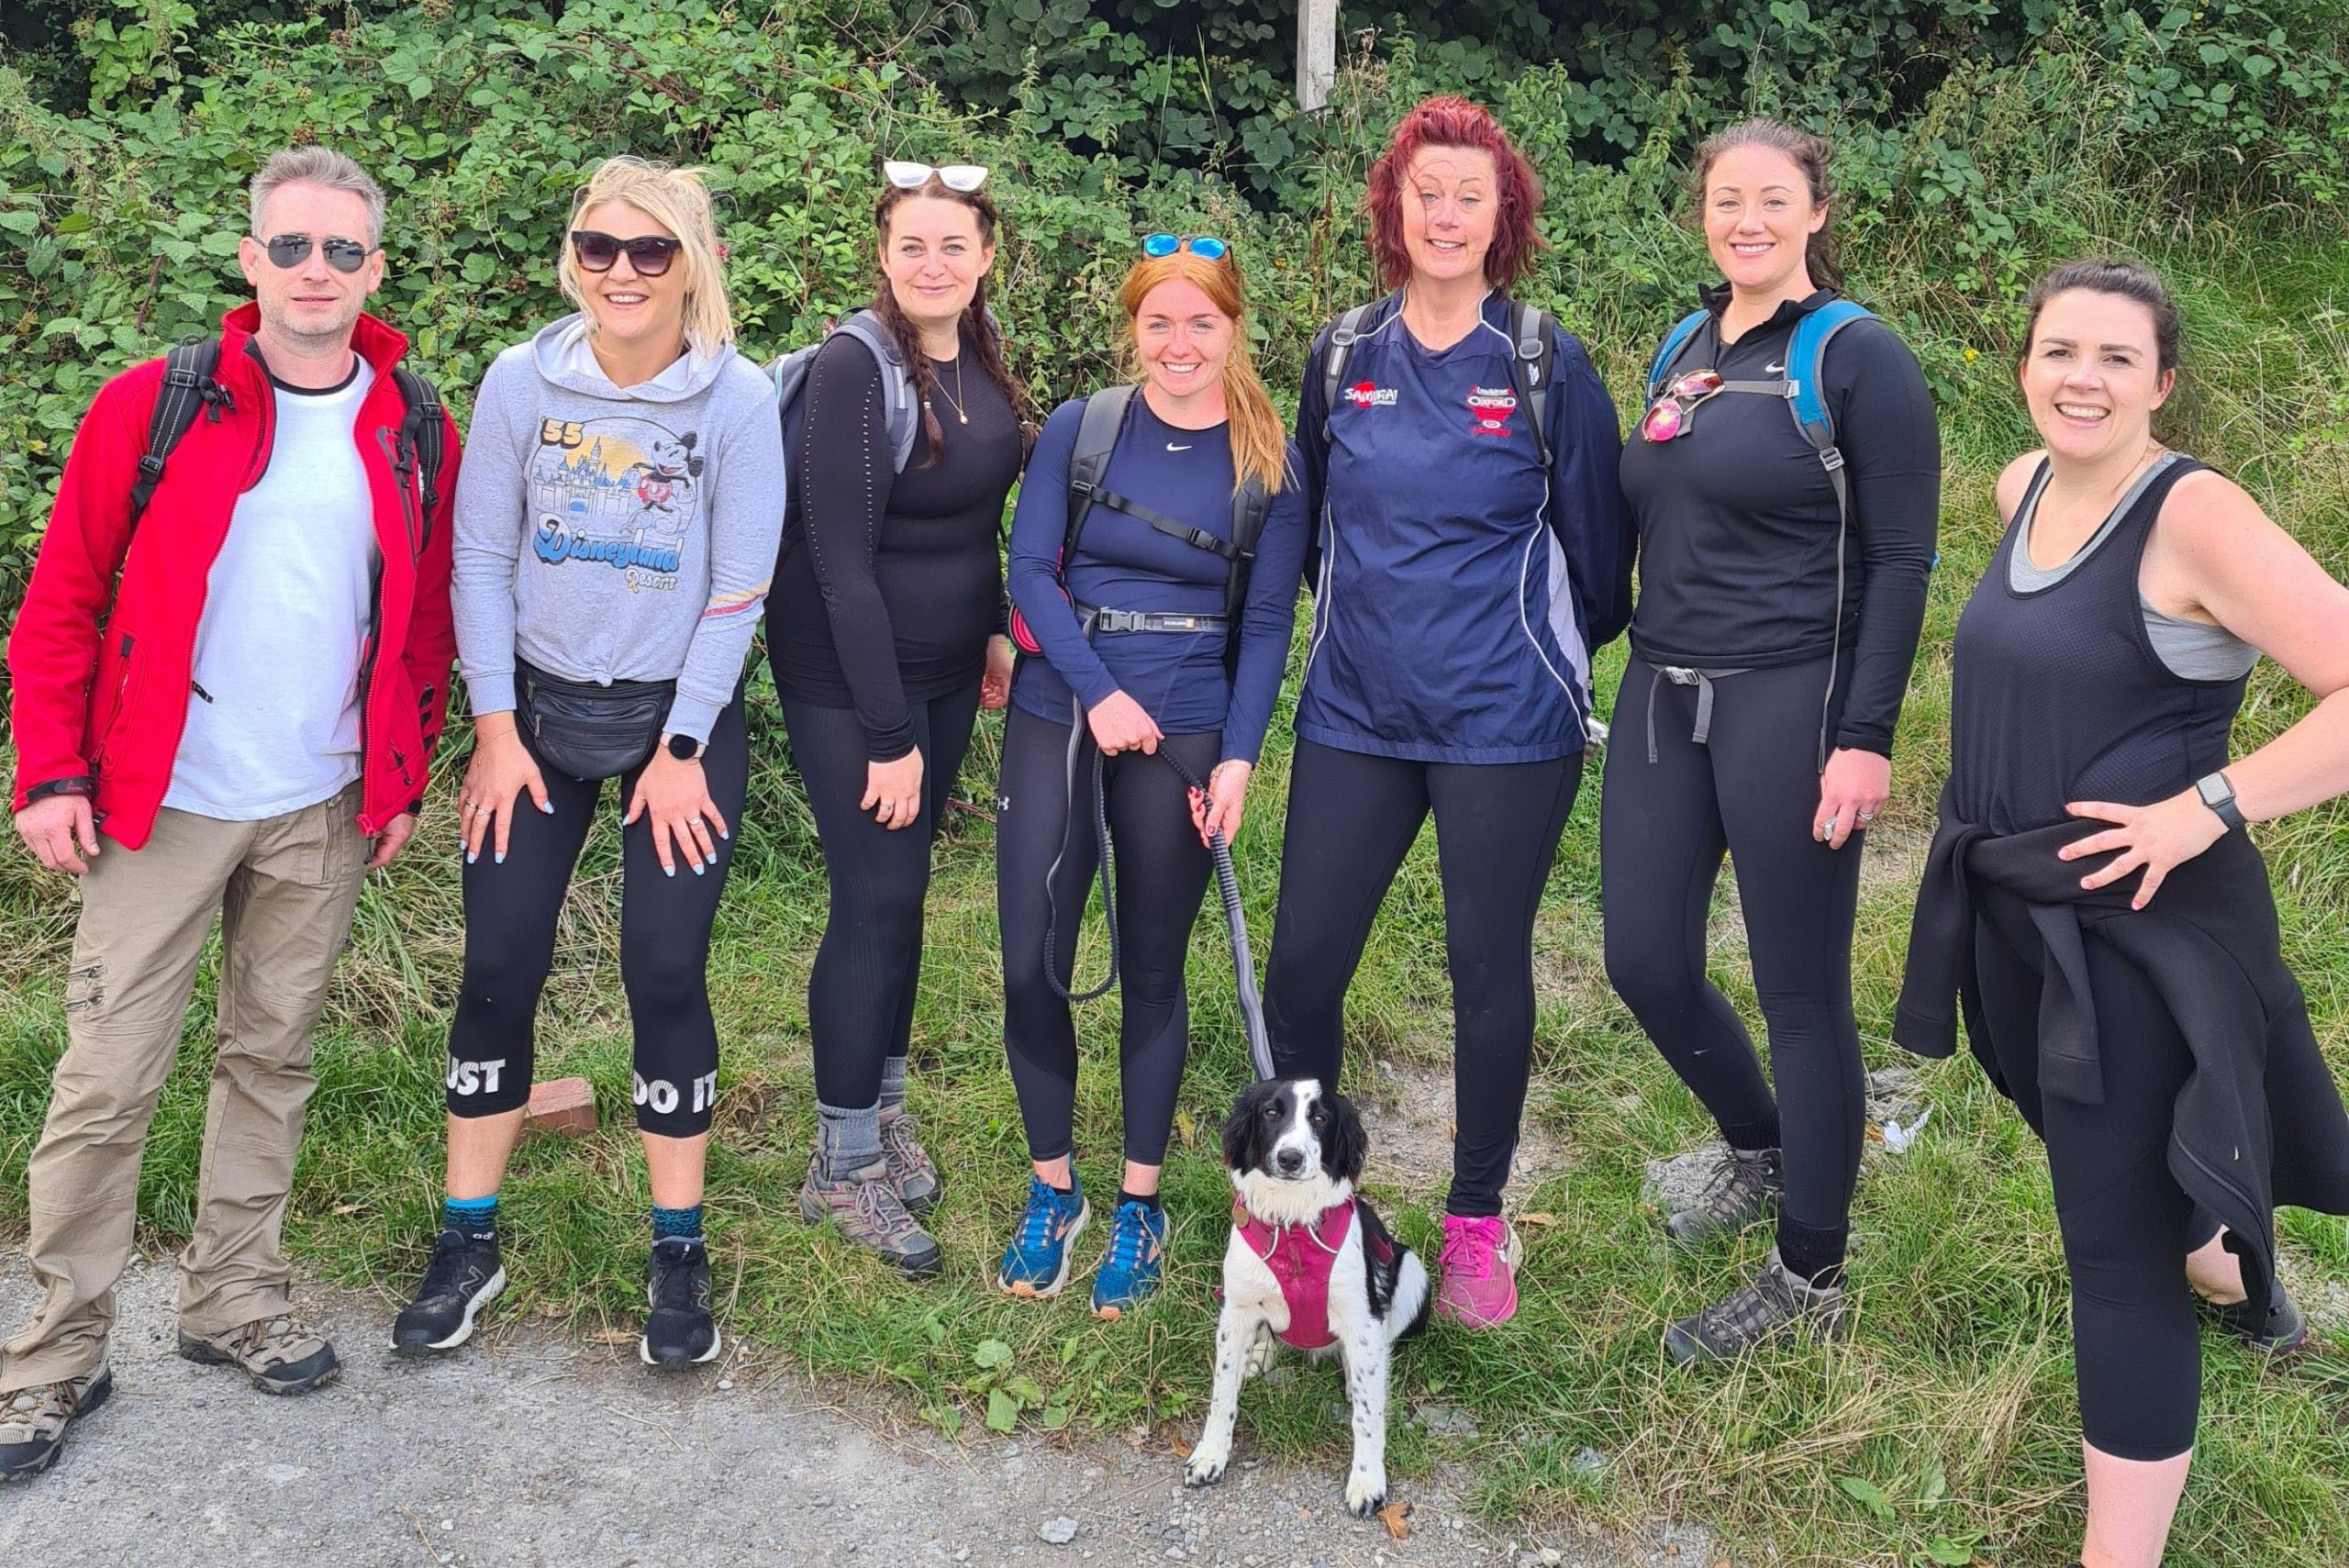 Ellison team raise over £1,700 with 20-mile sponsored walk